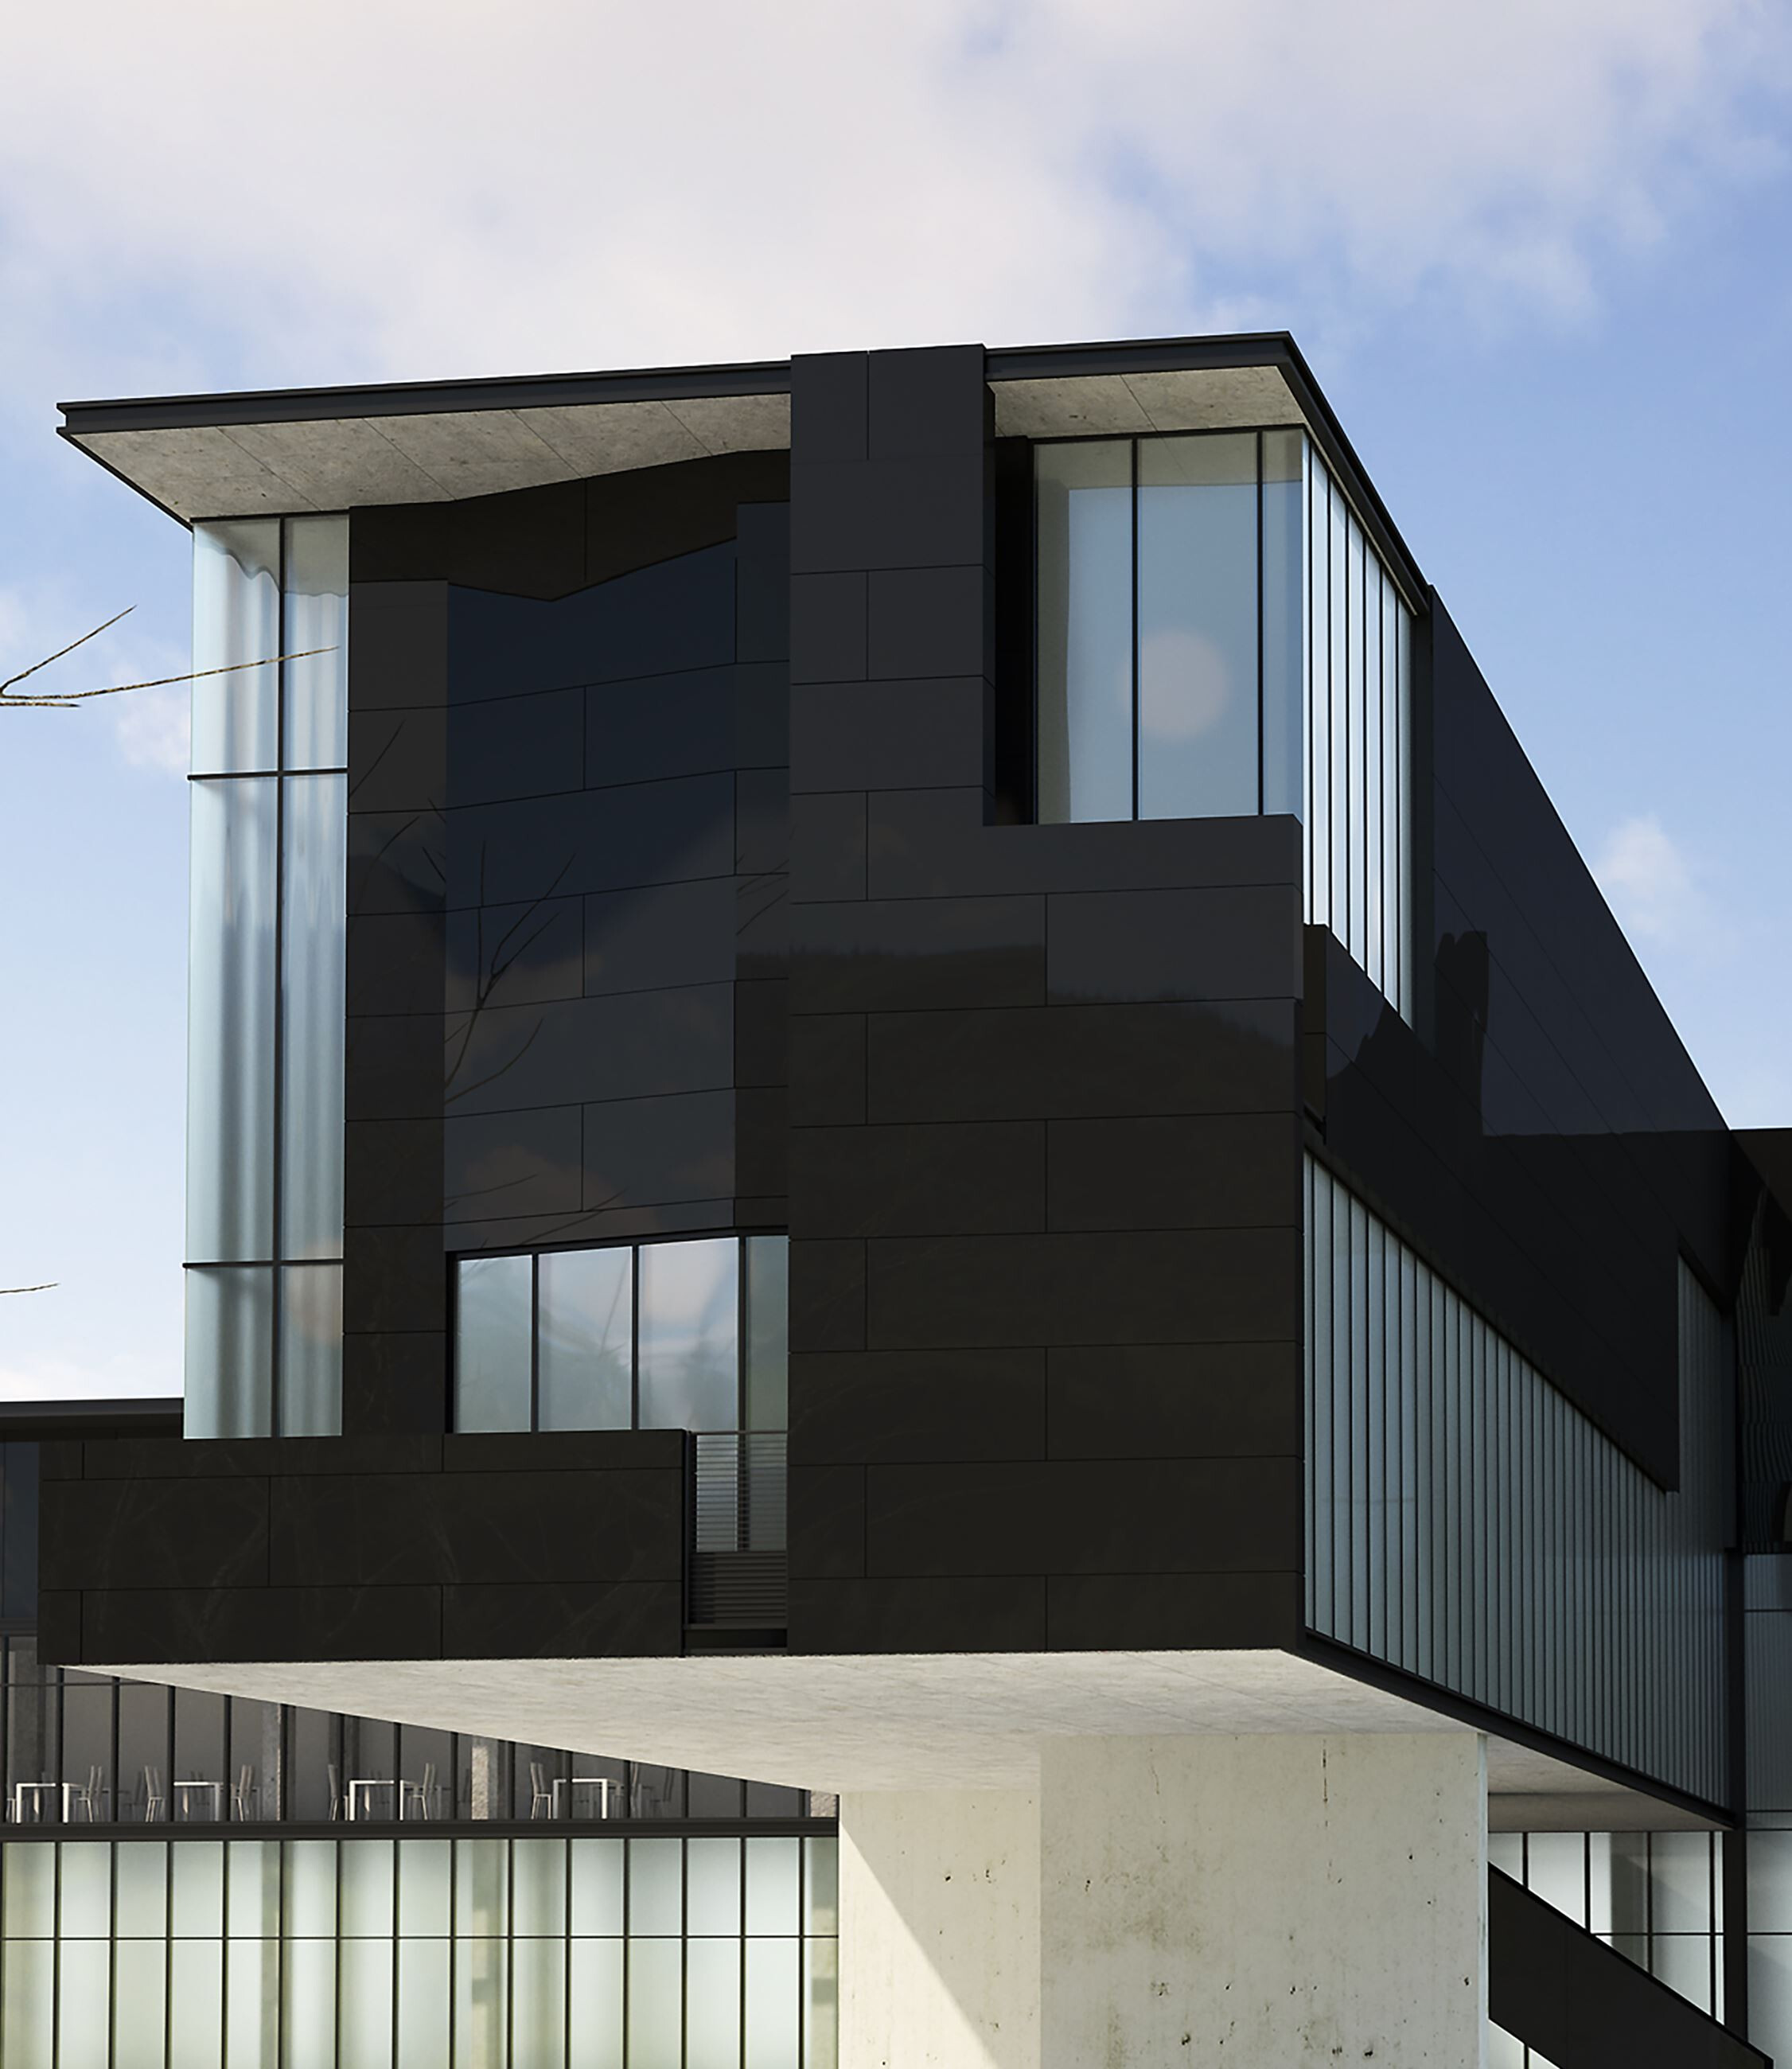 Exteriors - microventilated façades